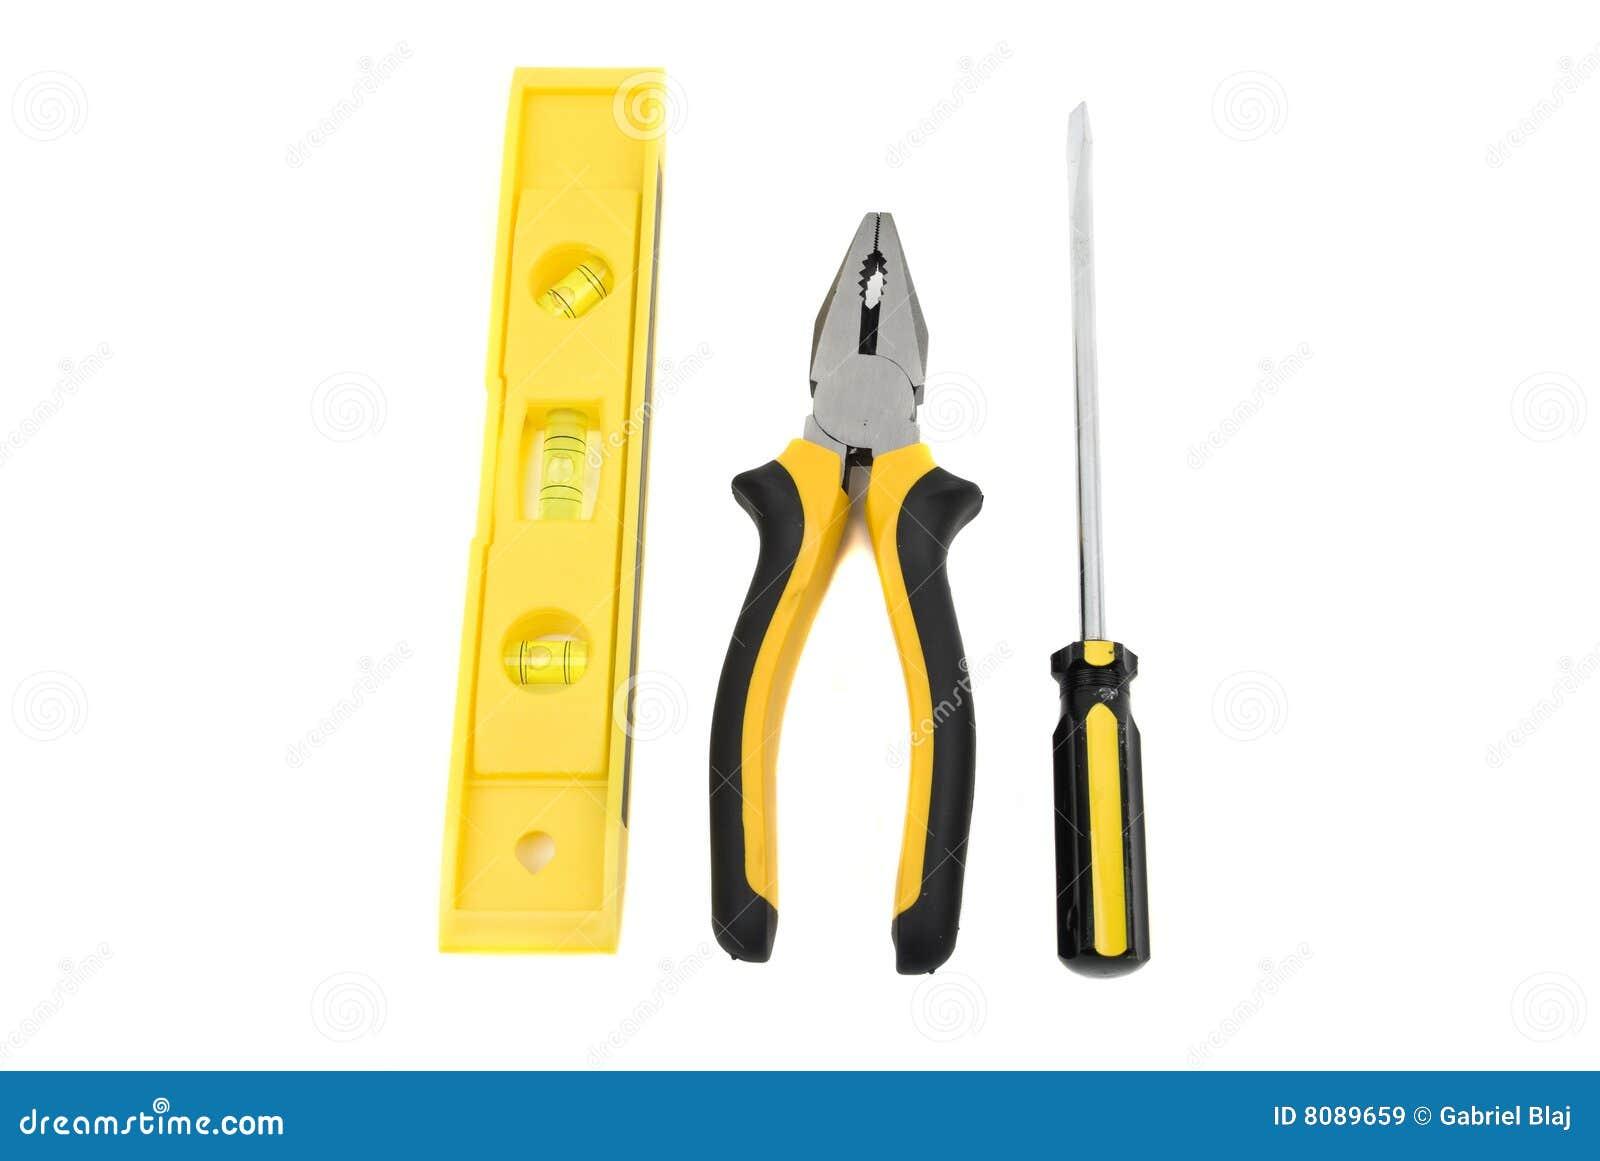 Three construction tools